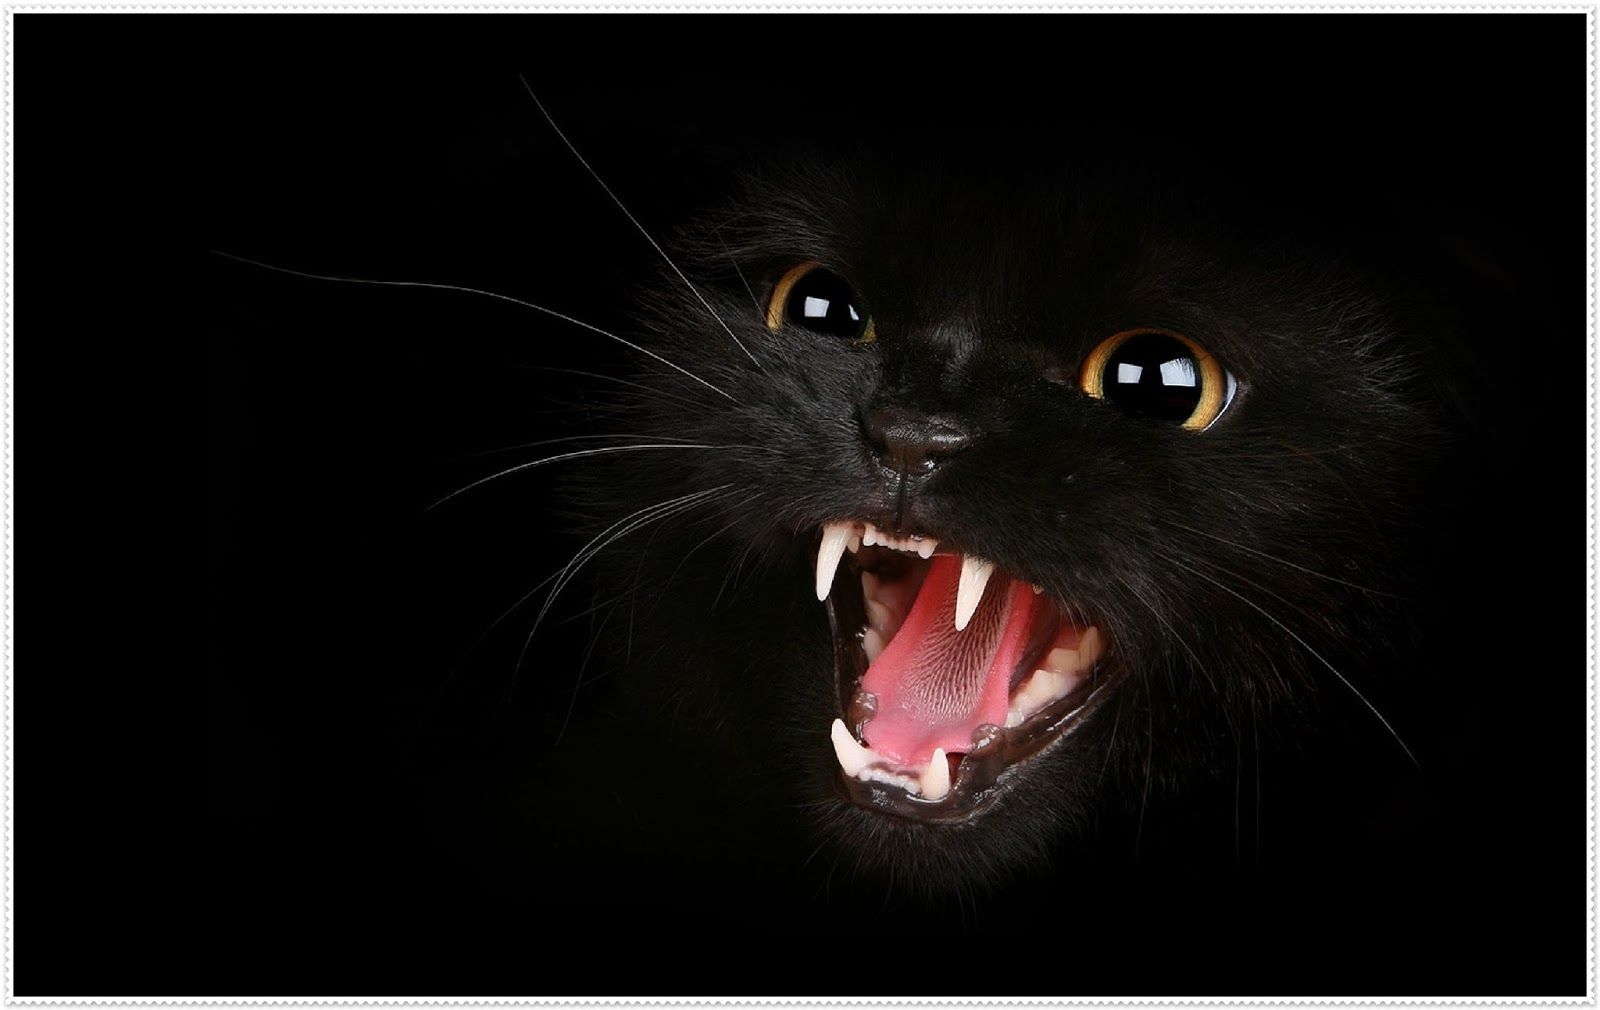 Gambar Kartun Muka Kucing Gokil Abis